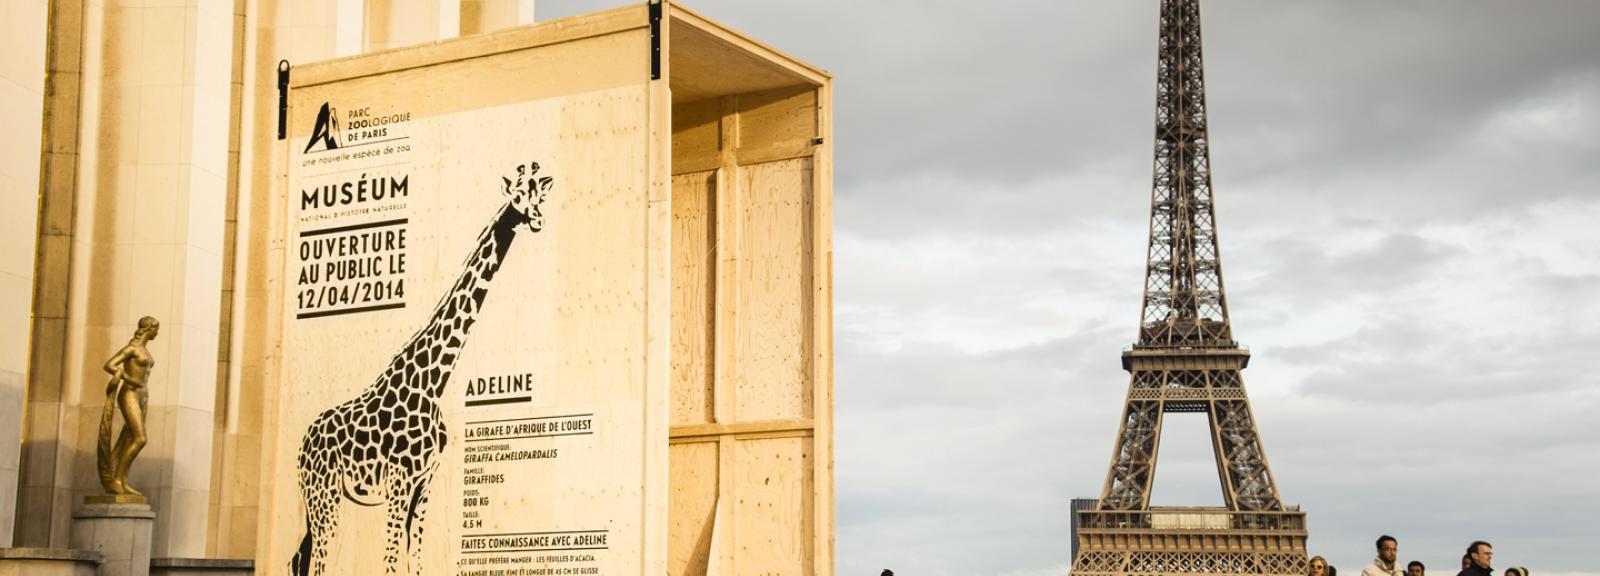 Esplanade des droits de l'homme, Adeline la girafe © Ubi bene